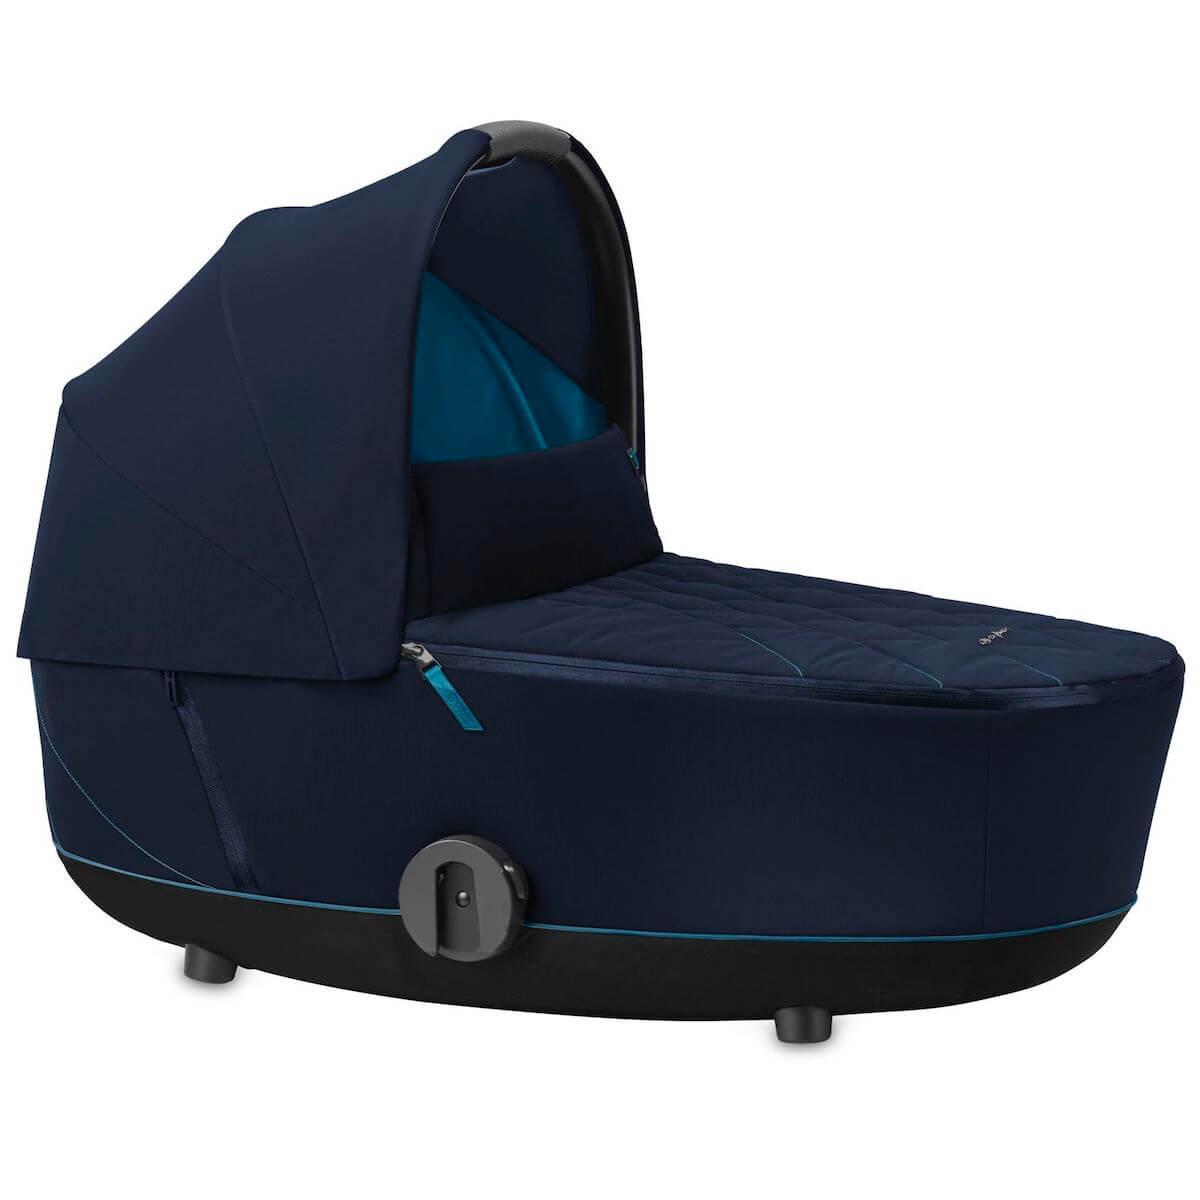 Kinderwagenaufsatz luxe MIOS Cybex Nautical Blue